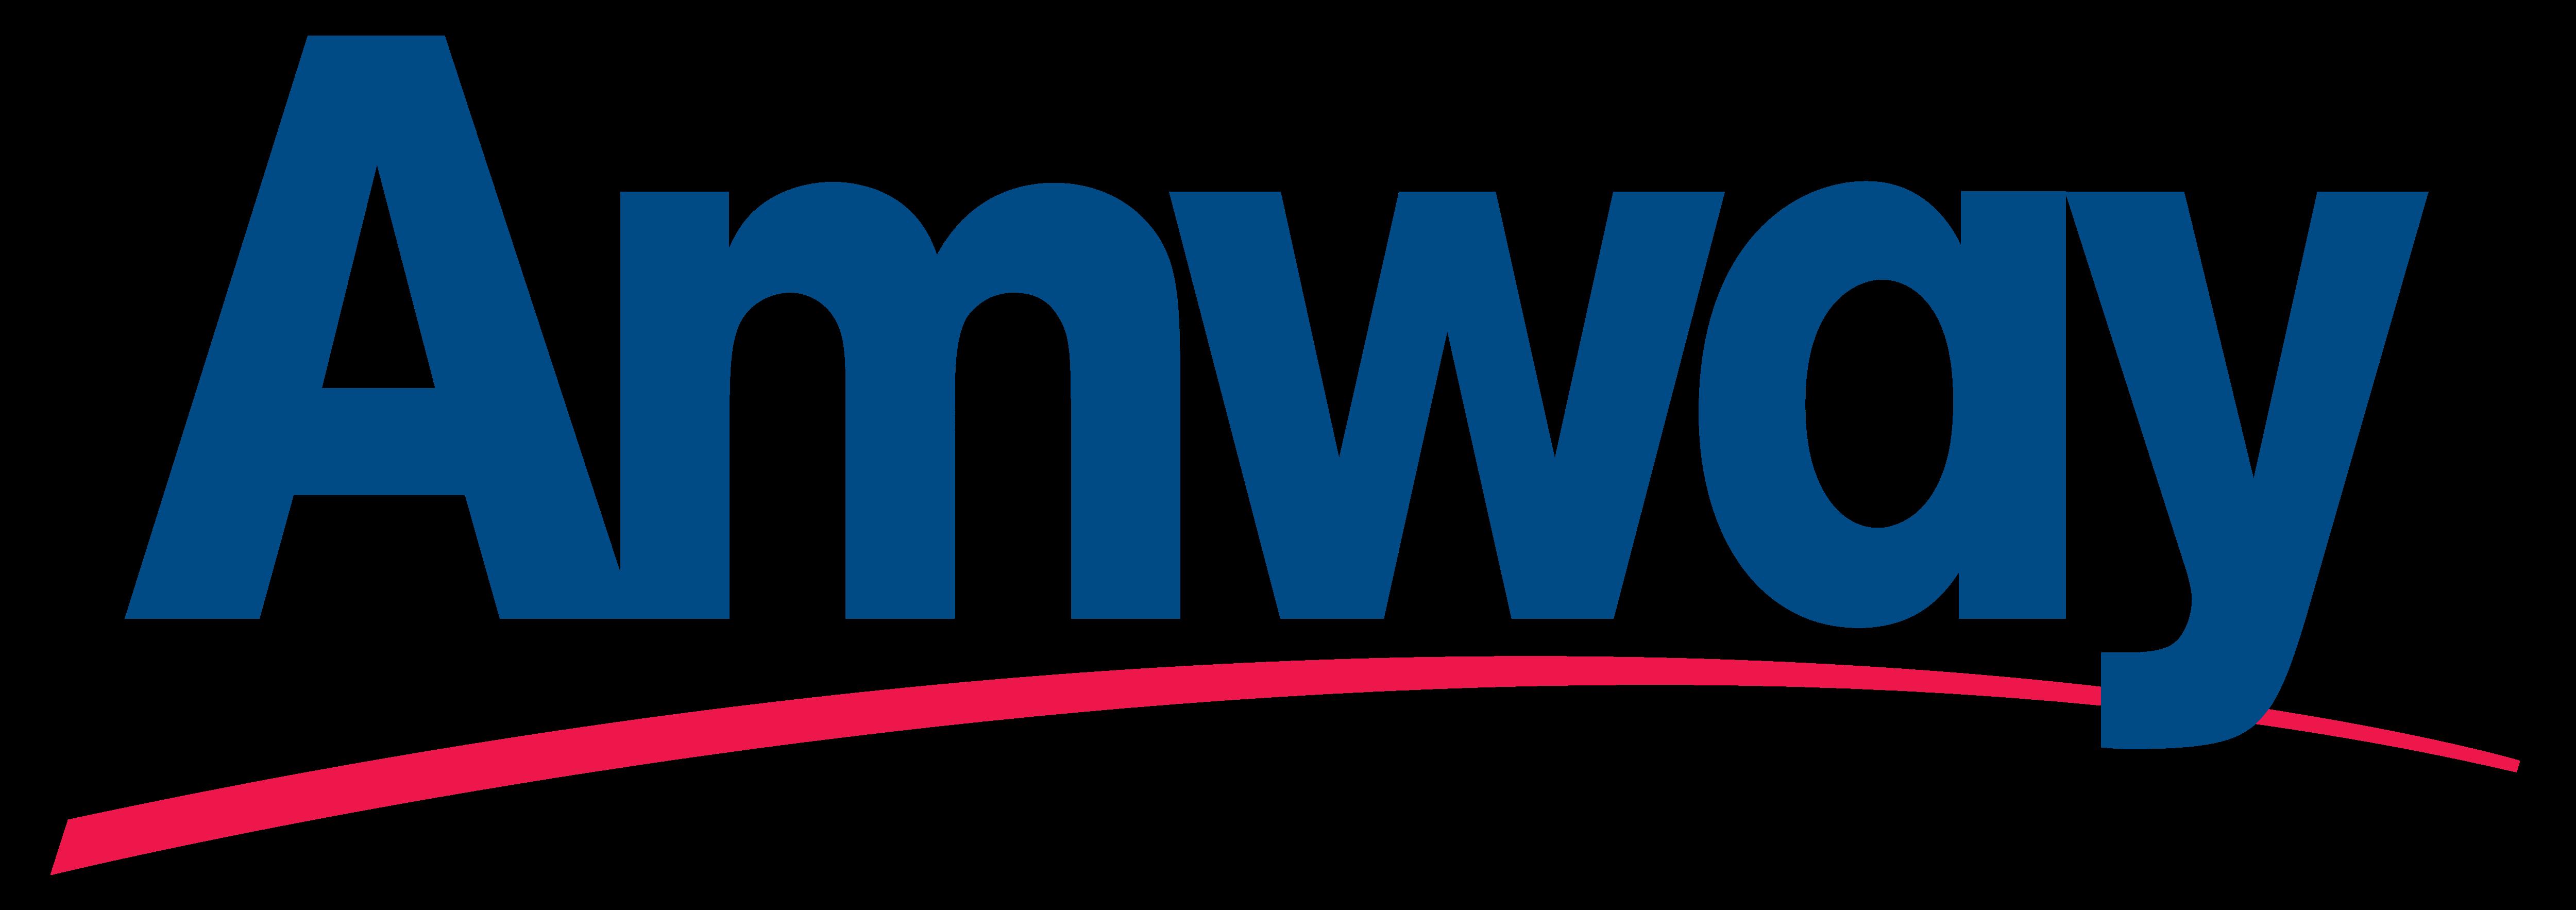 Amway logo 2 (lighter version) - Amway Deutschland Logo PNG